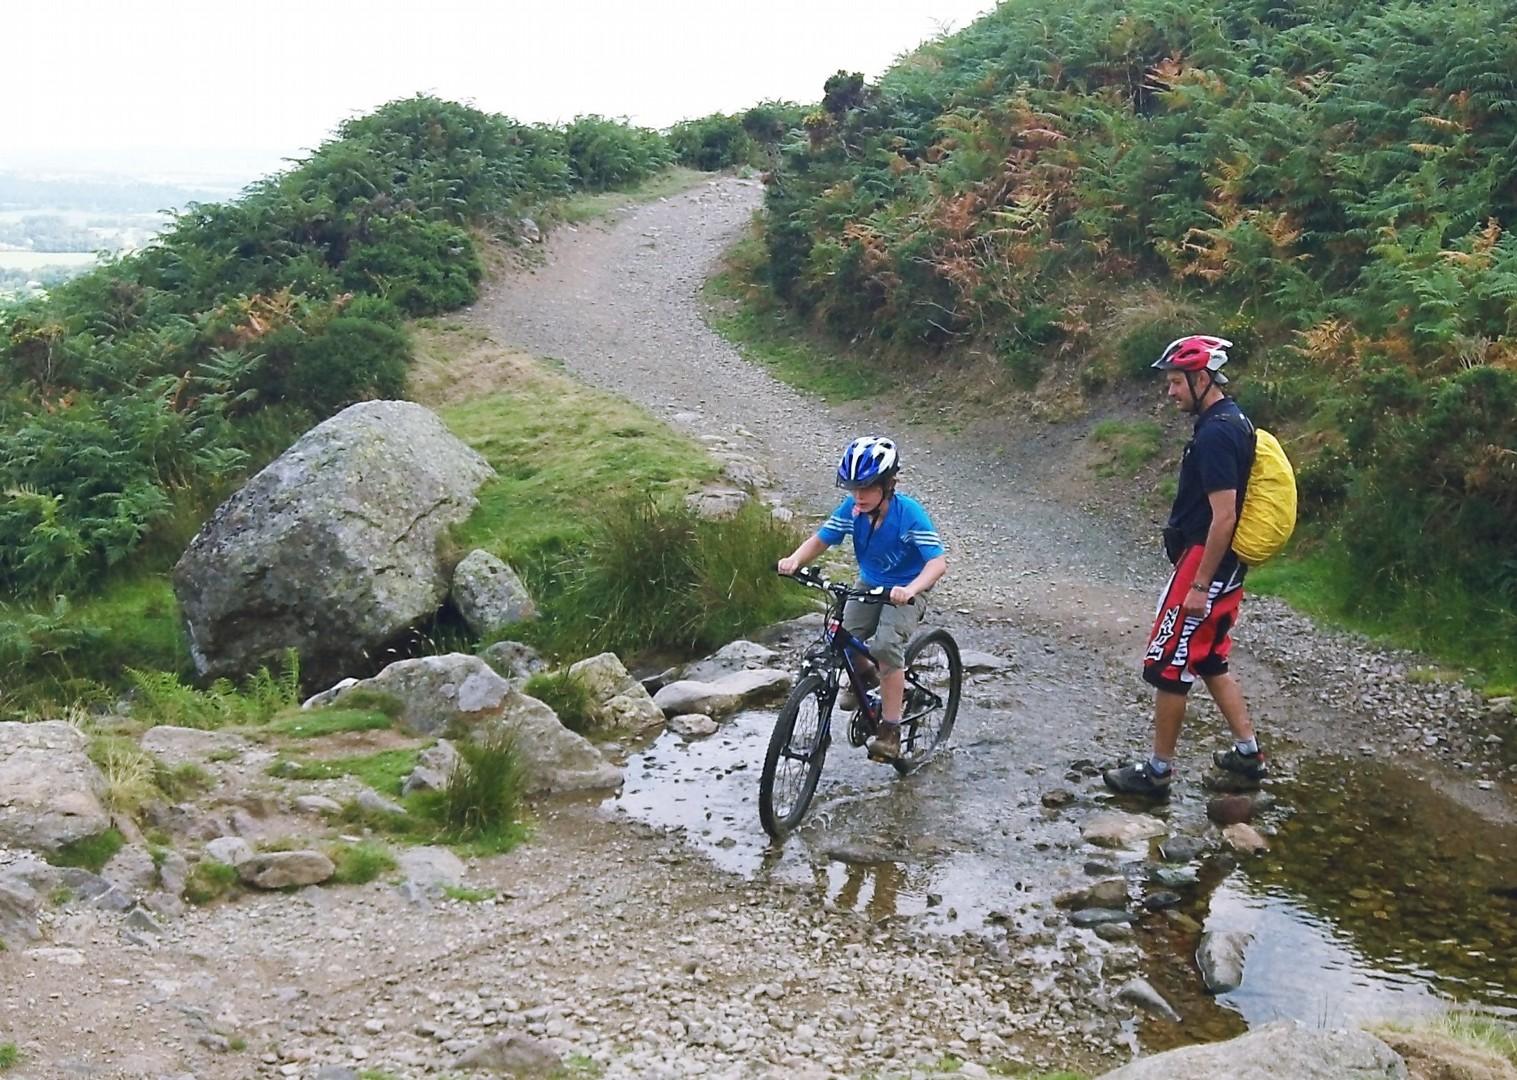 lake-district-uk-bike-skills.jpg - UK - Lake District - Guided Family Bike Skills - Family Cycling